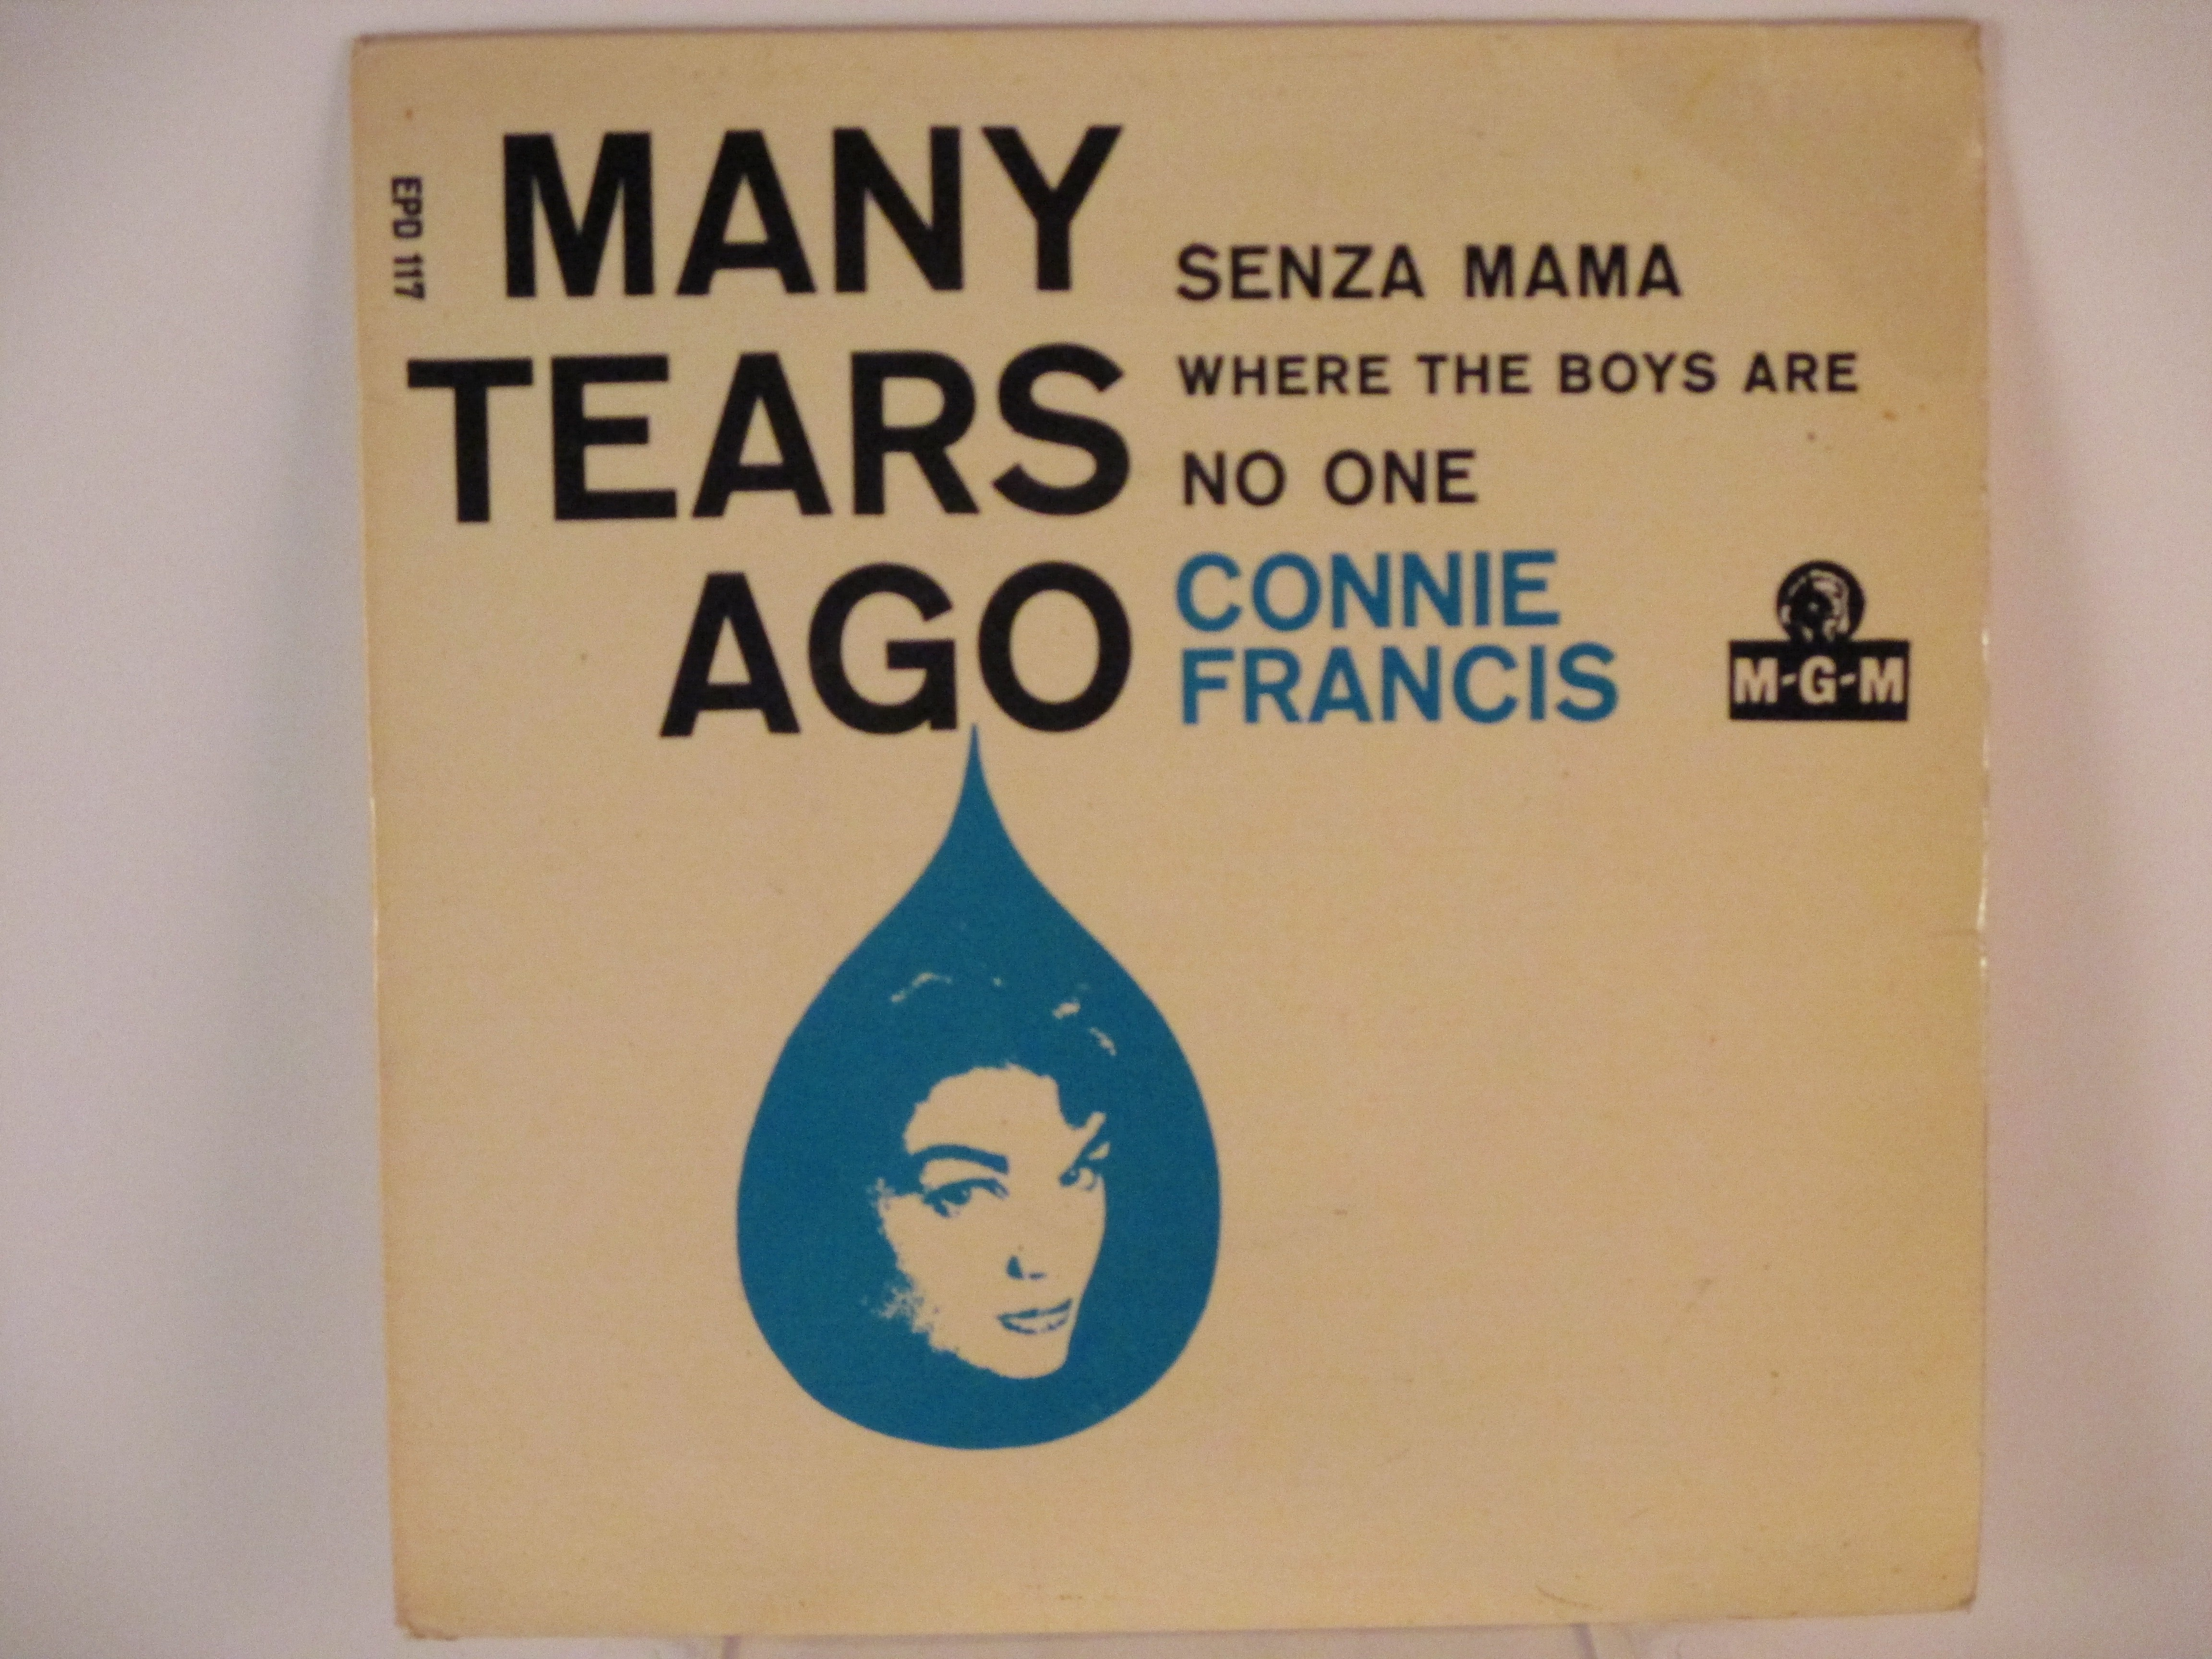 CONNIE FRANCIS : (EP) Many tears ago / Senza mama / Where the boys are / No one